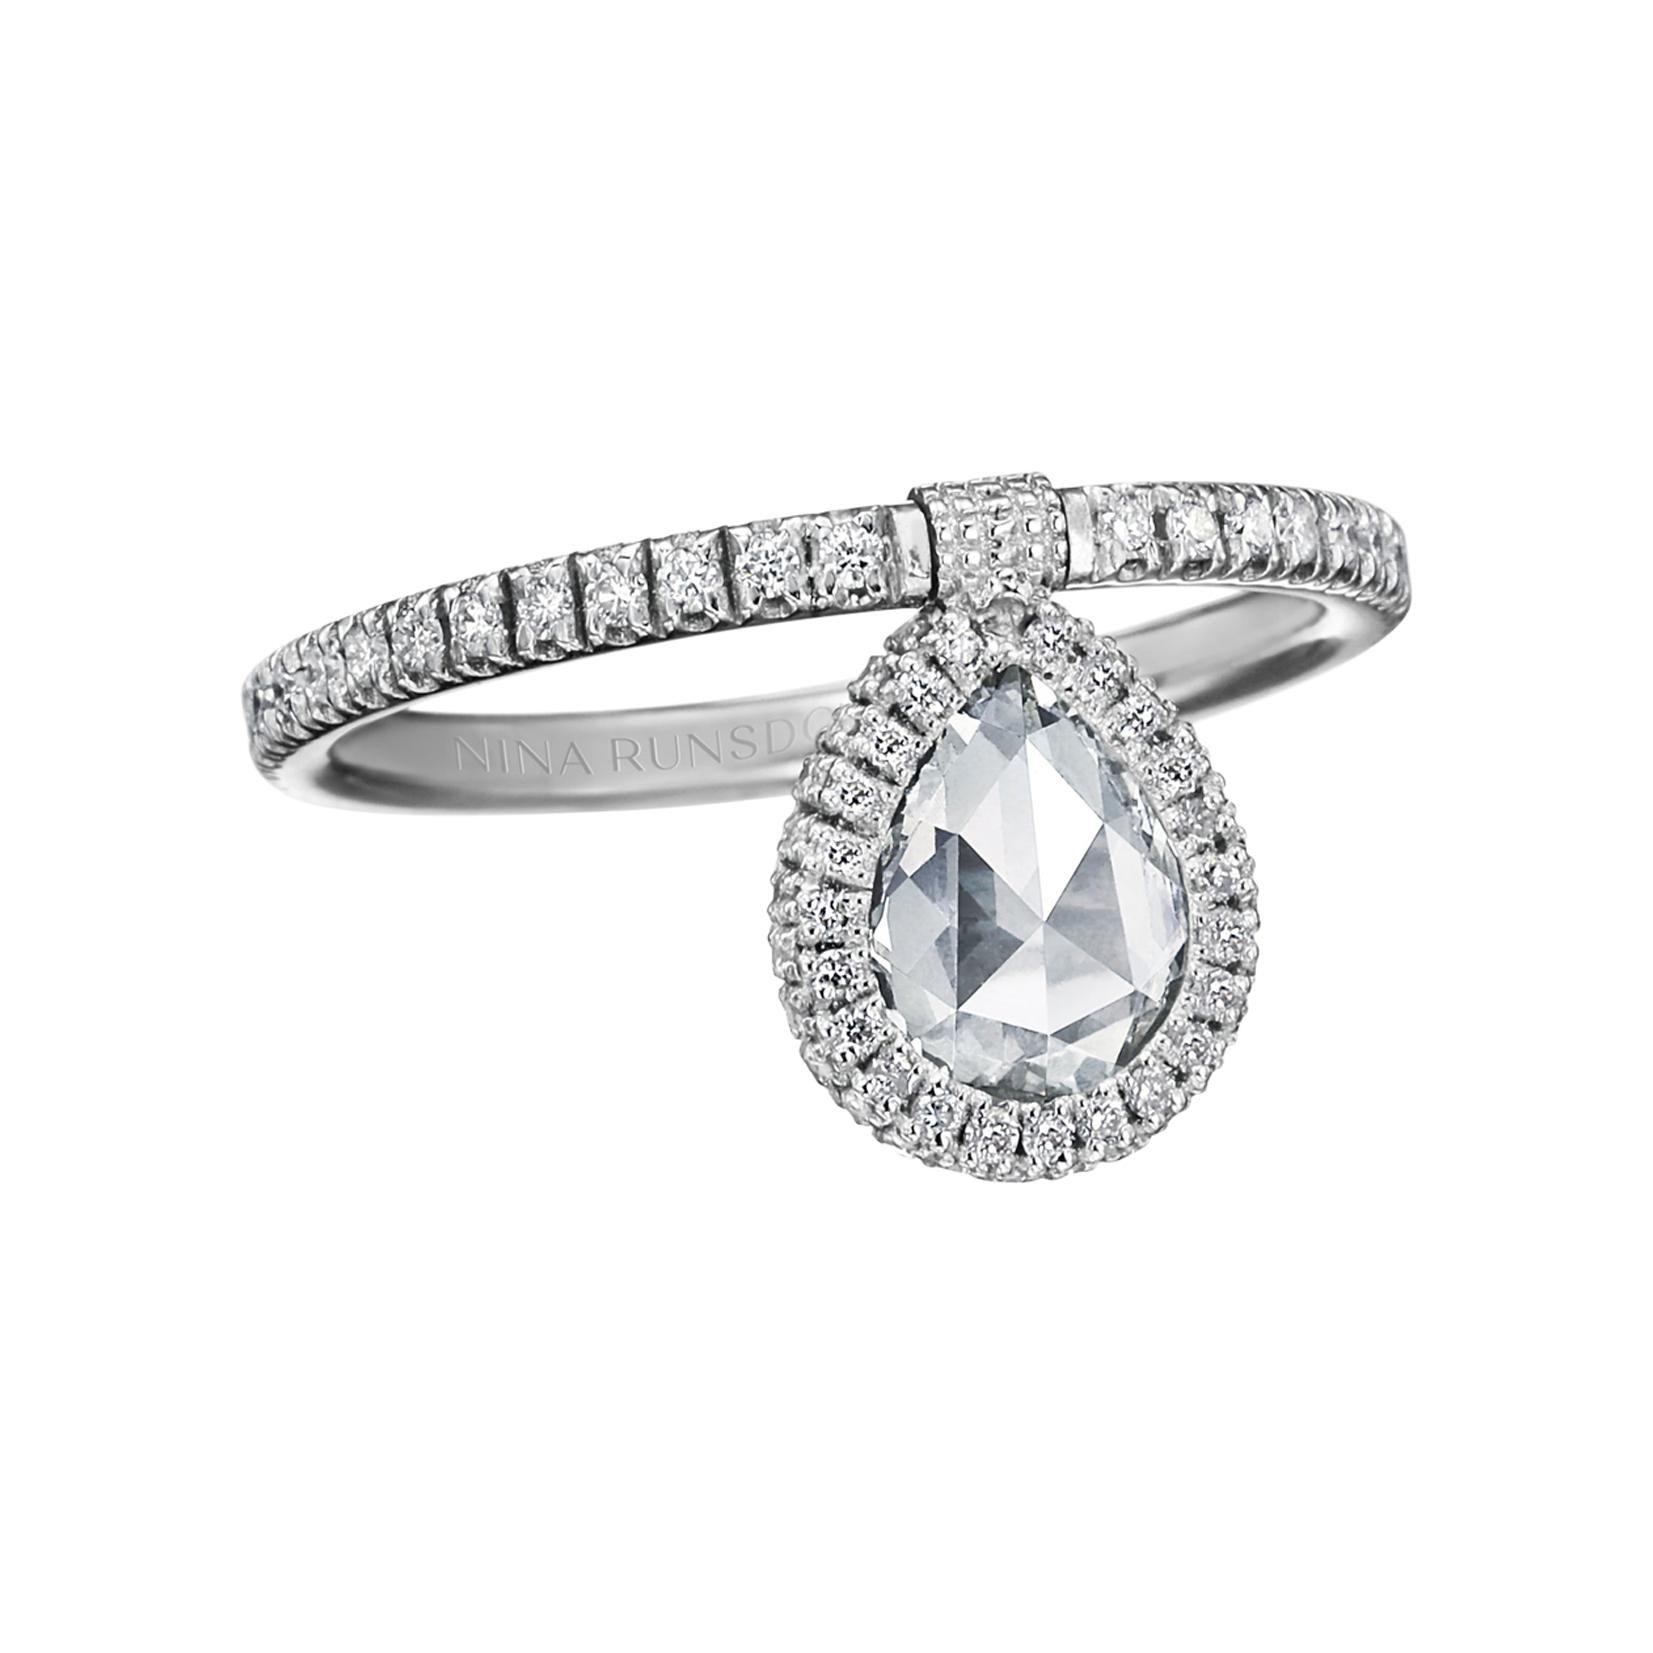 Nina Runsdorf White Gold Rosecut Diamond Flip Ring